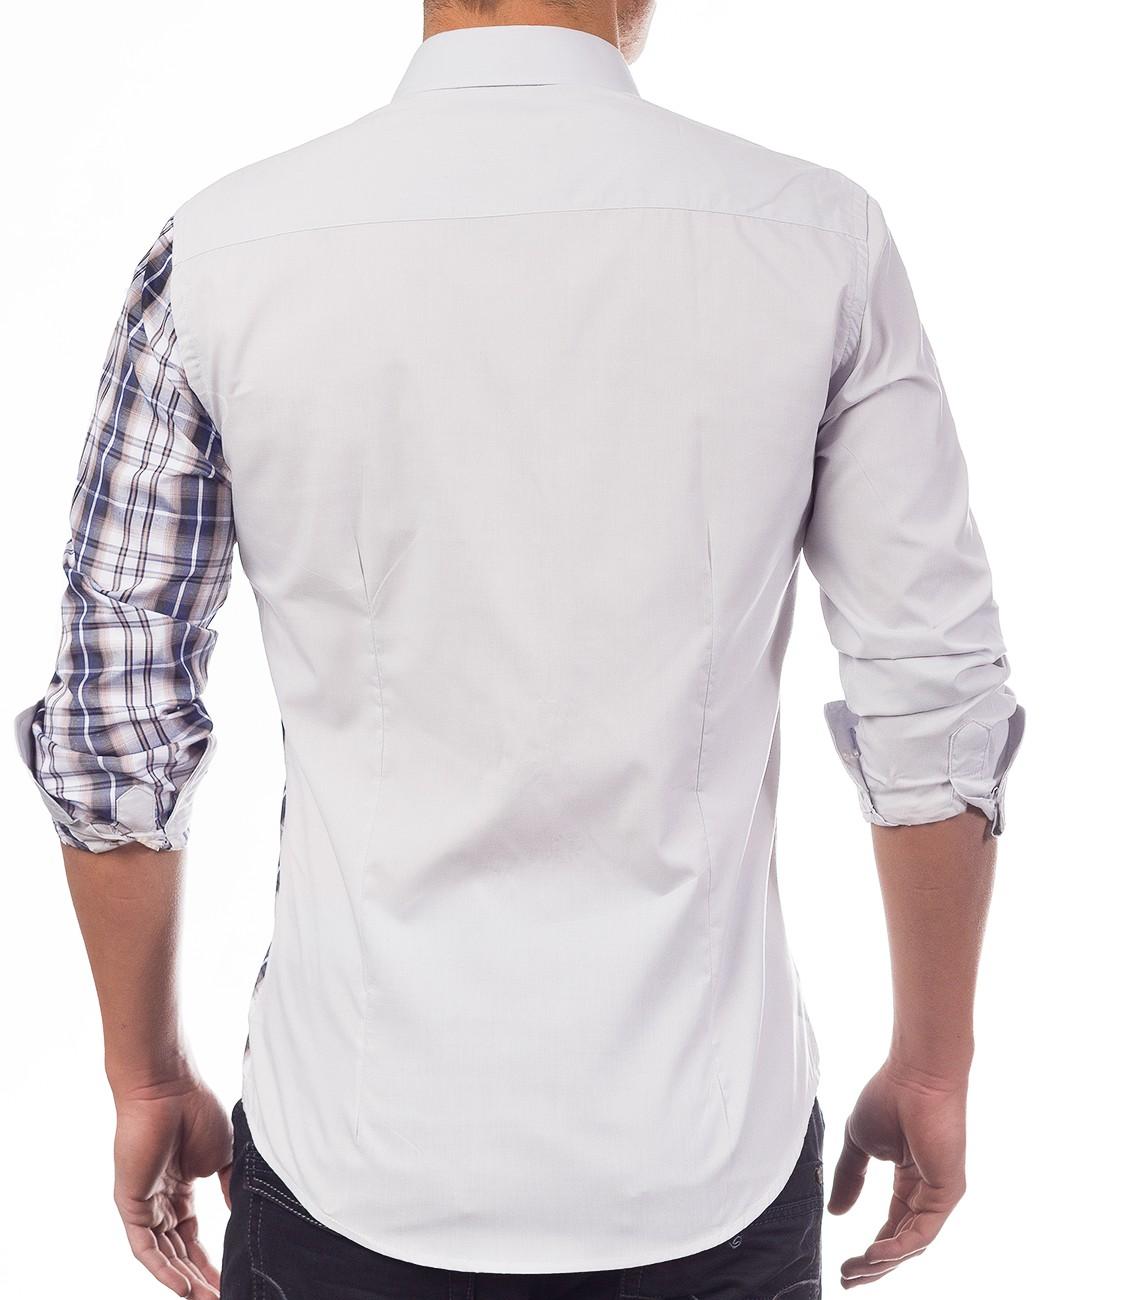 Herrenhemd langarm kariert Poloshirt SlimFit Freizeithemd Casual 4 Farben